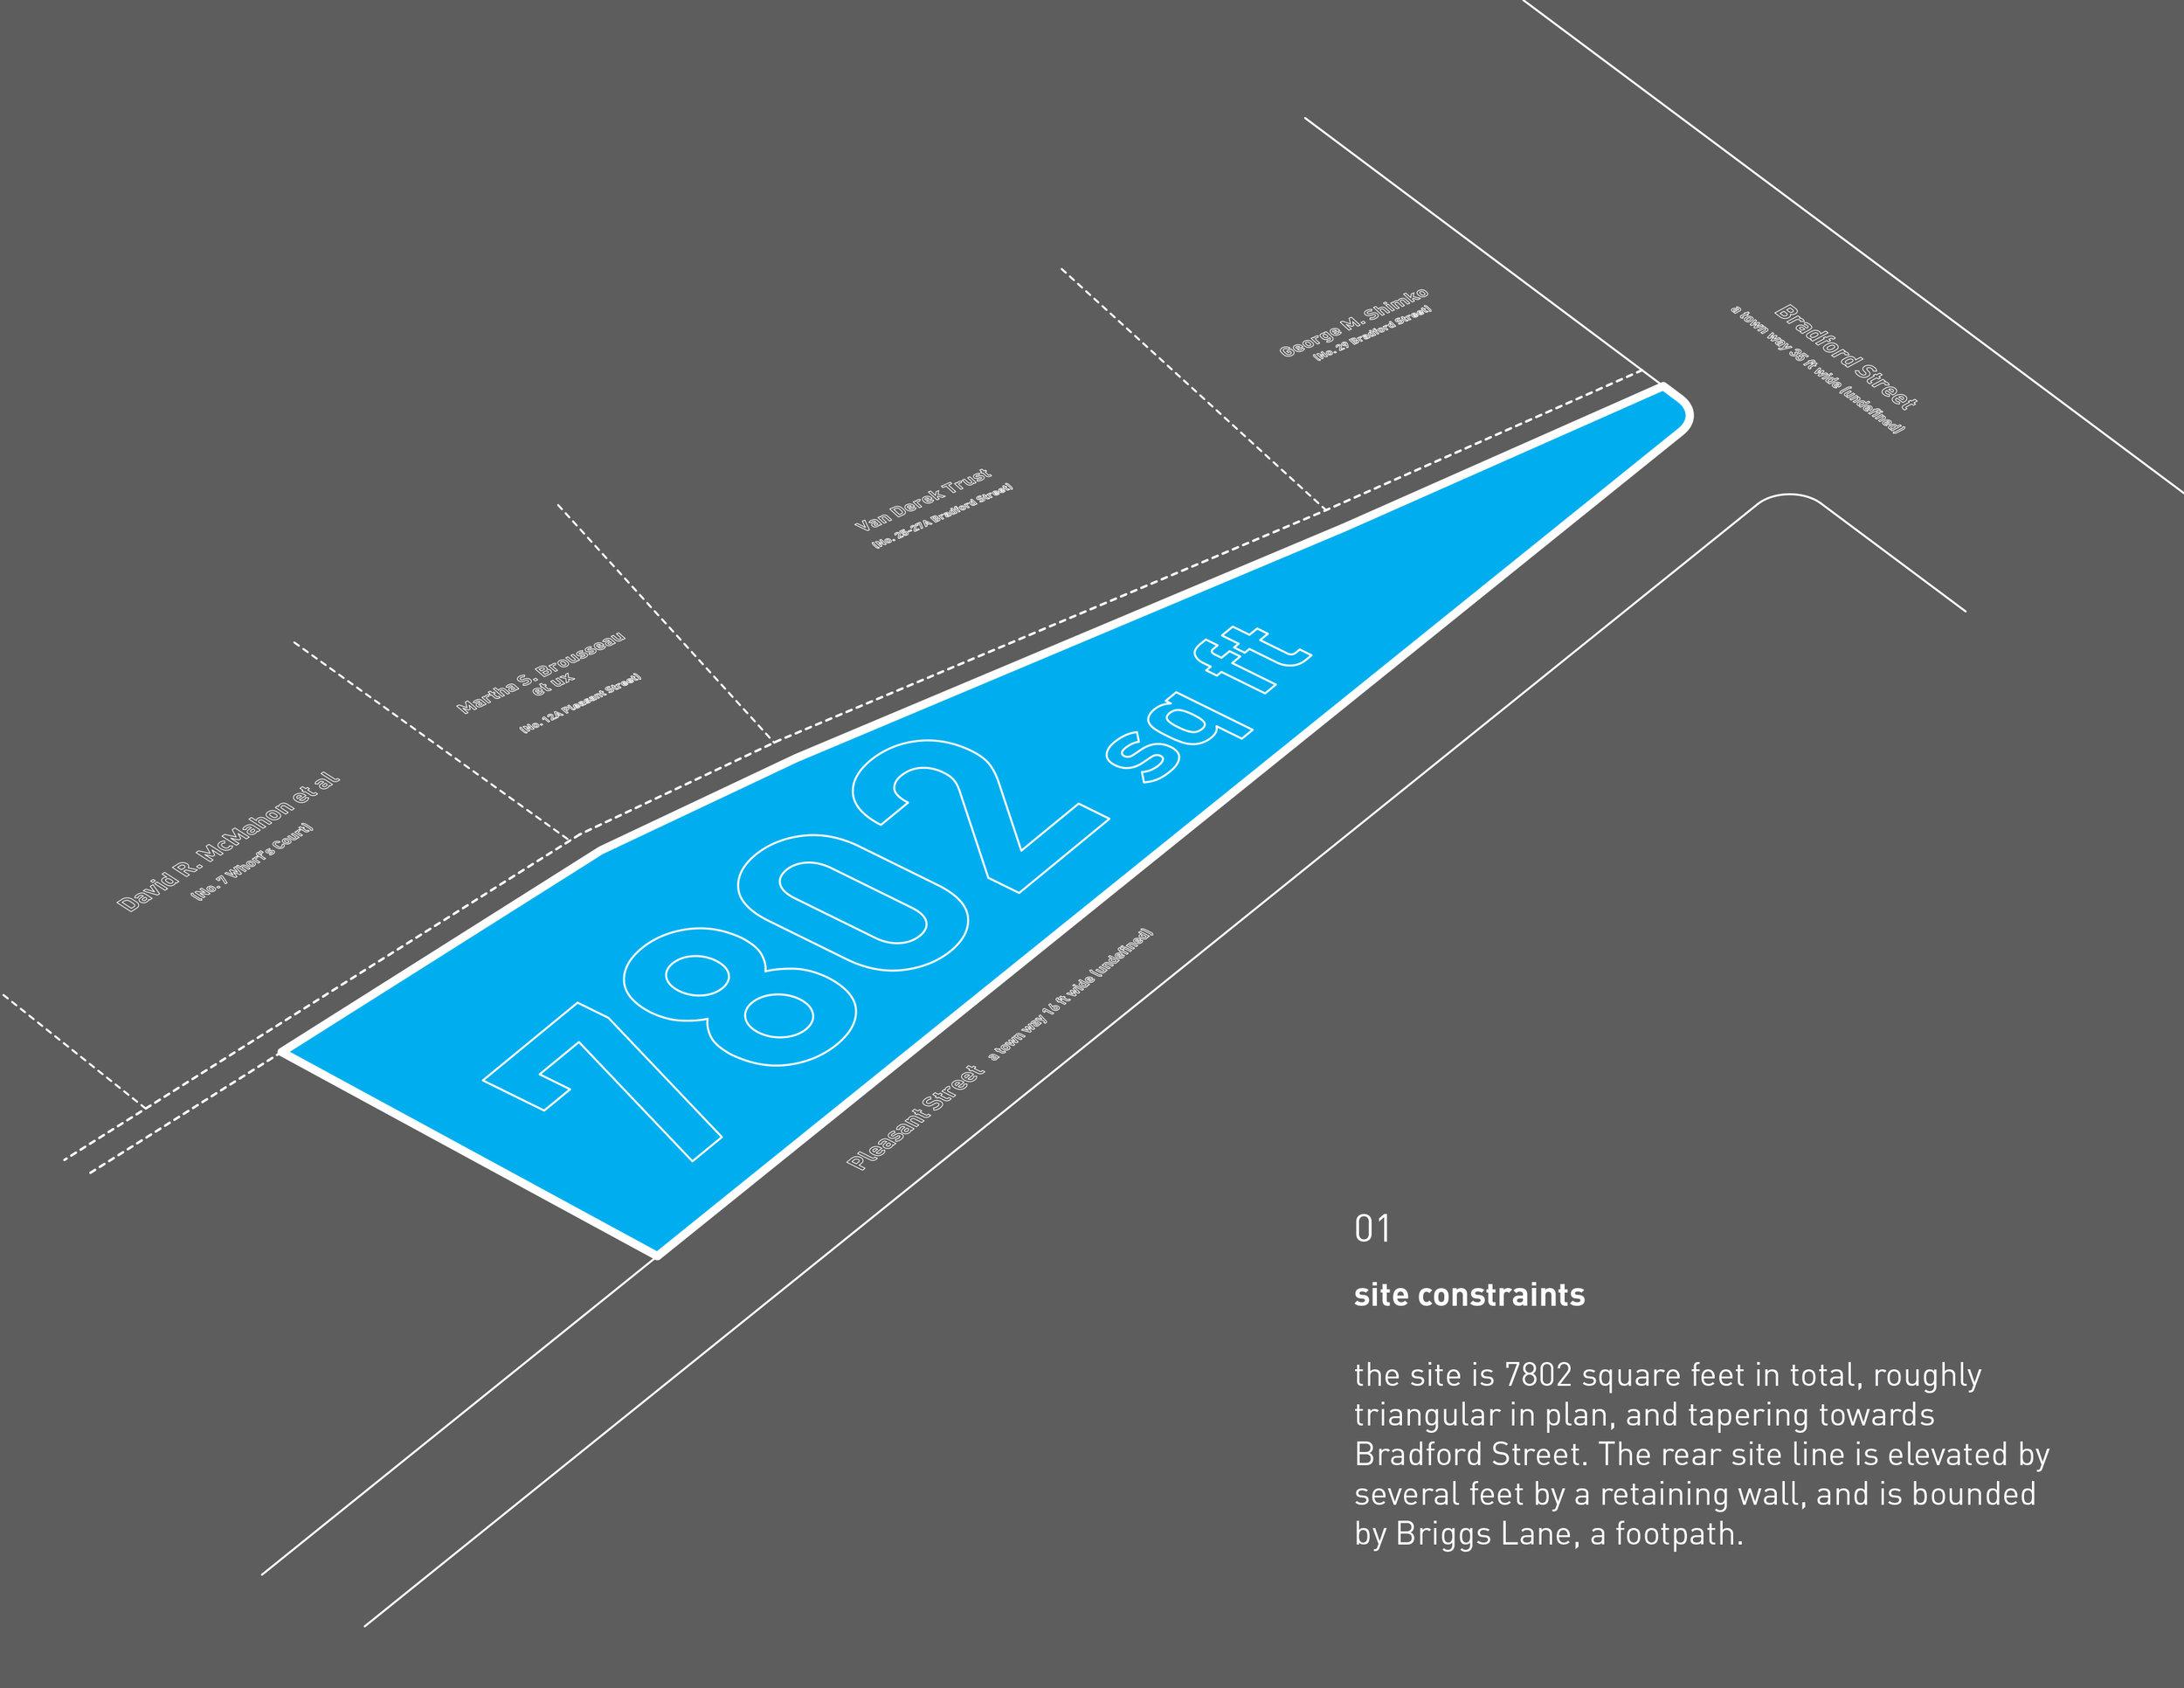 diagrams01.jpg